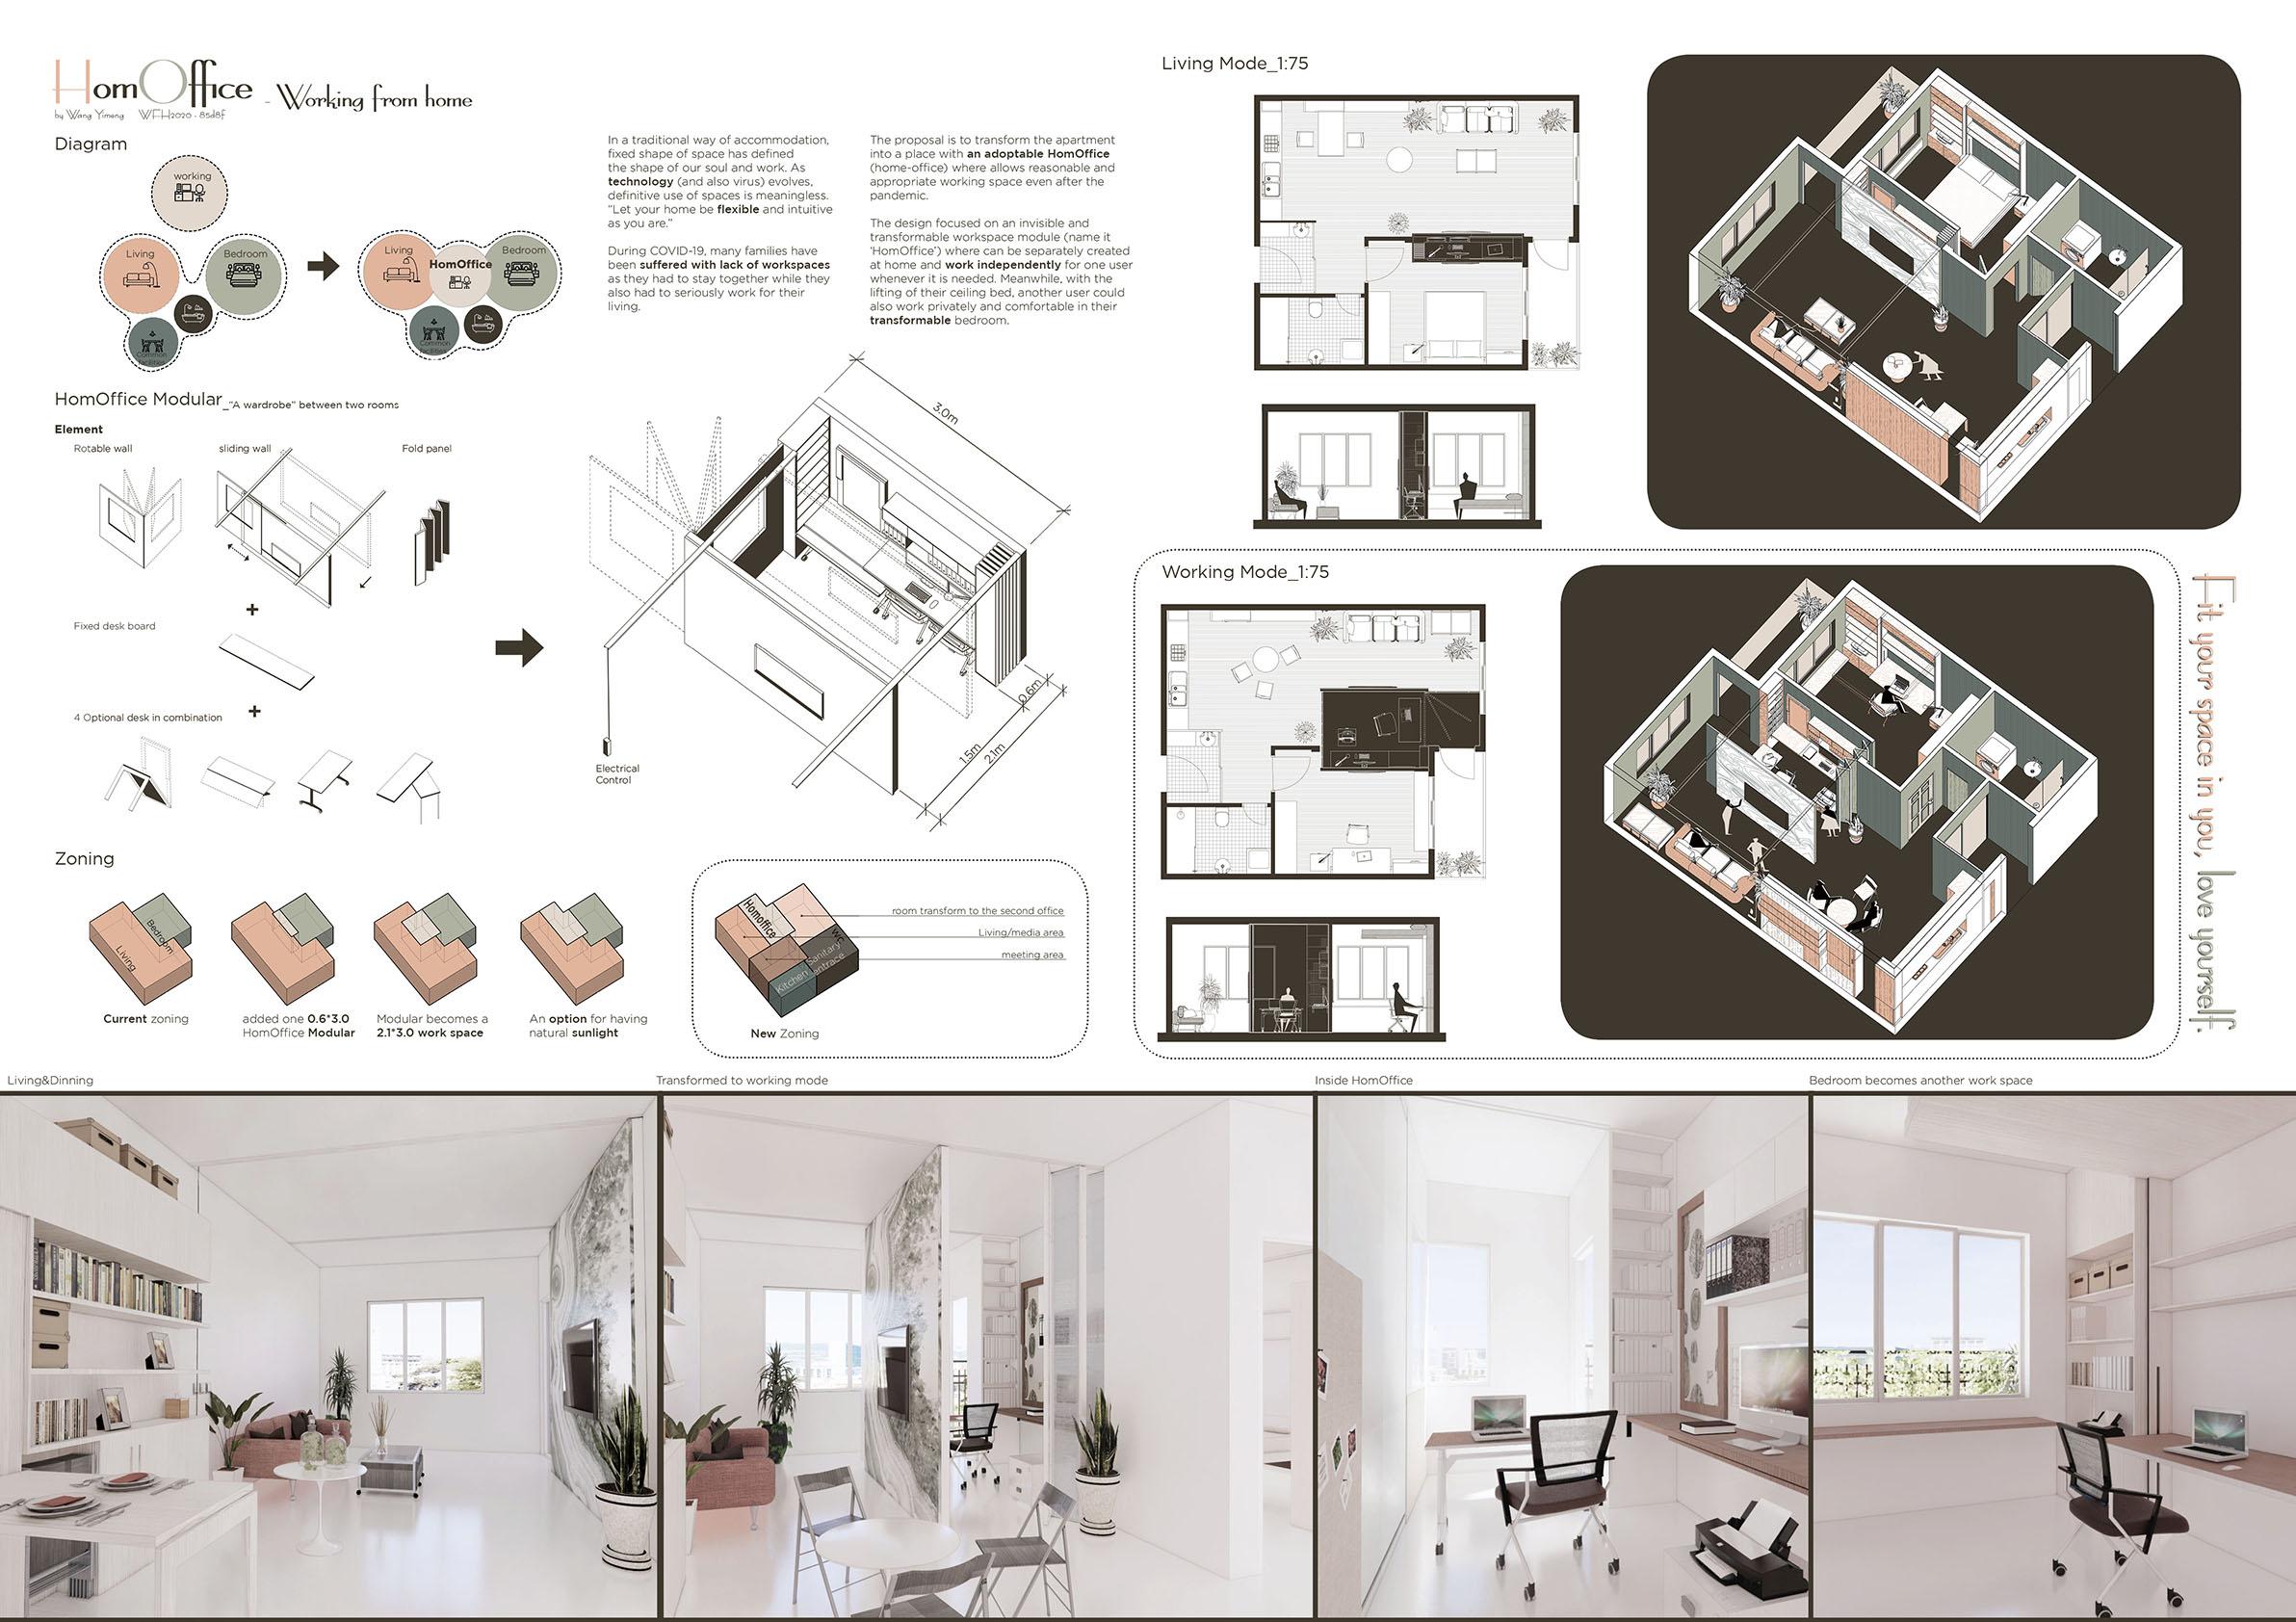 HomOffice_redo-reshape domesticity after Covid-19 Board